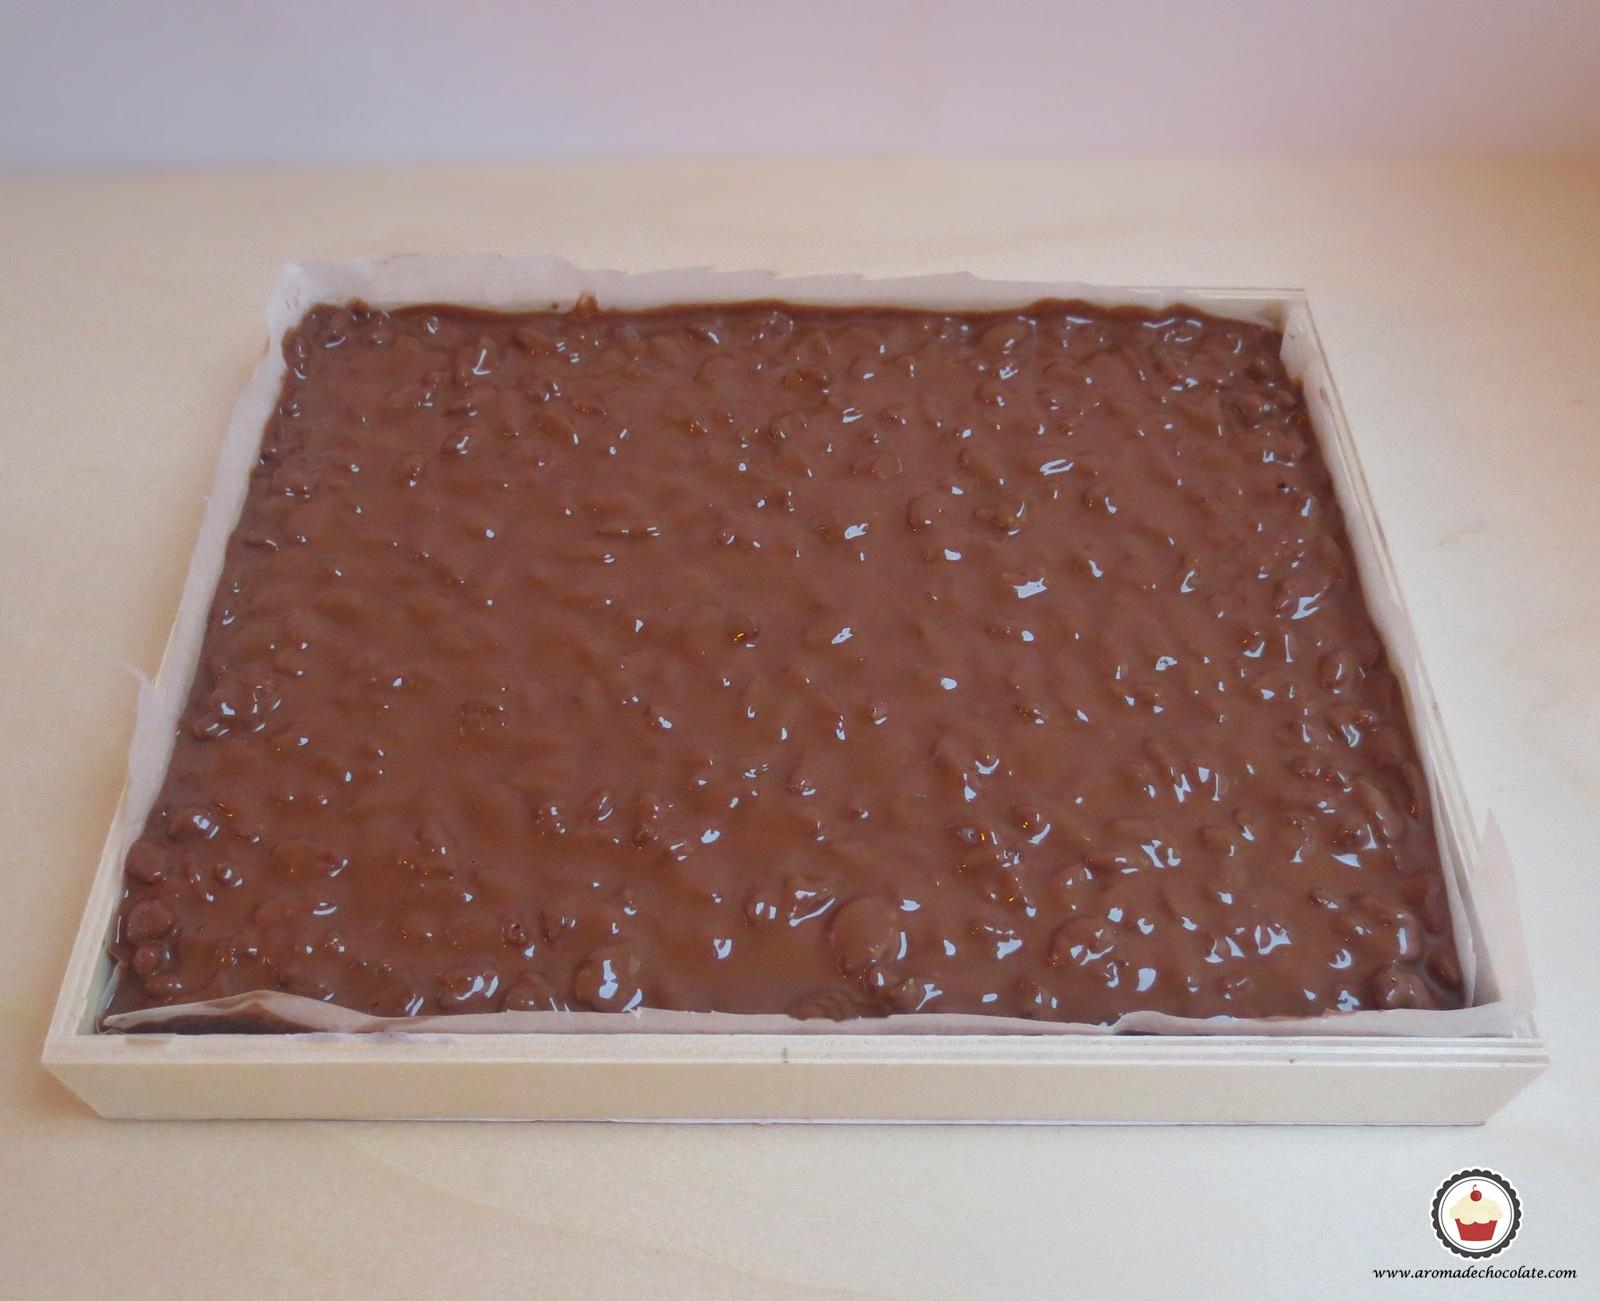 Turrón de chocolate en molde. Aroma de chocolate